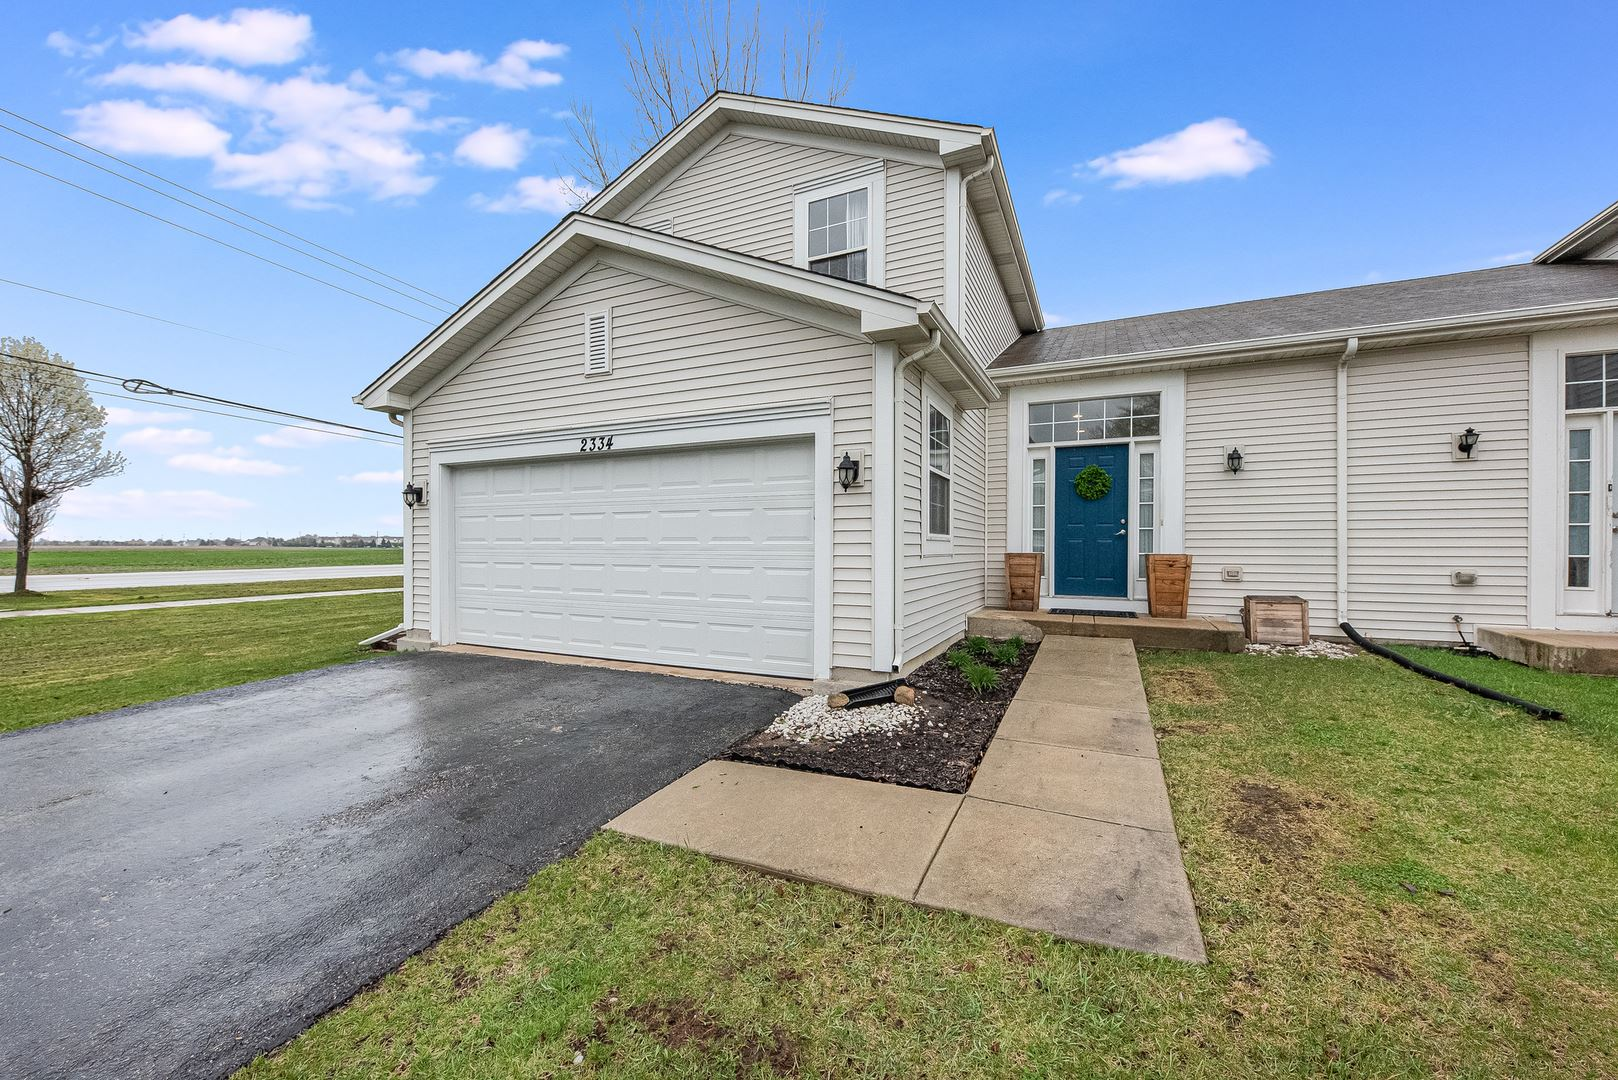 Photo of 2334 Carpenter Avenue, Plainfield, IL 60586 (MLS # 11053274)